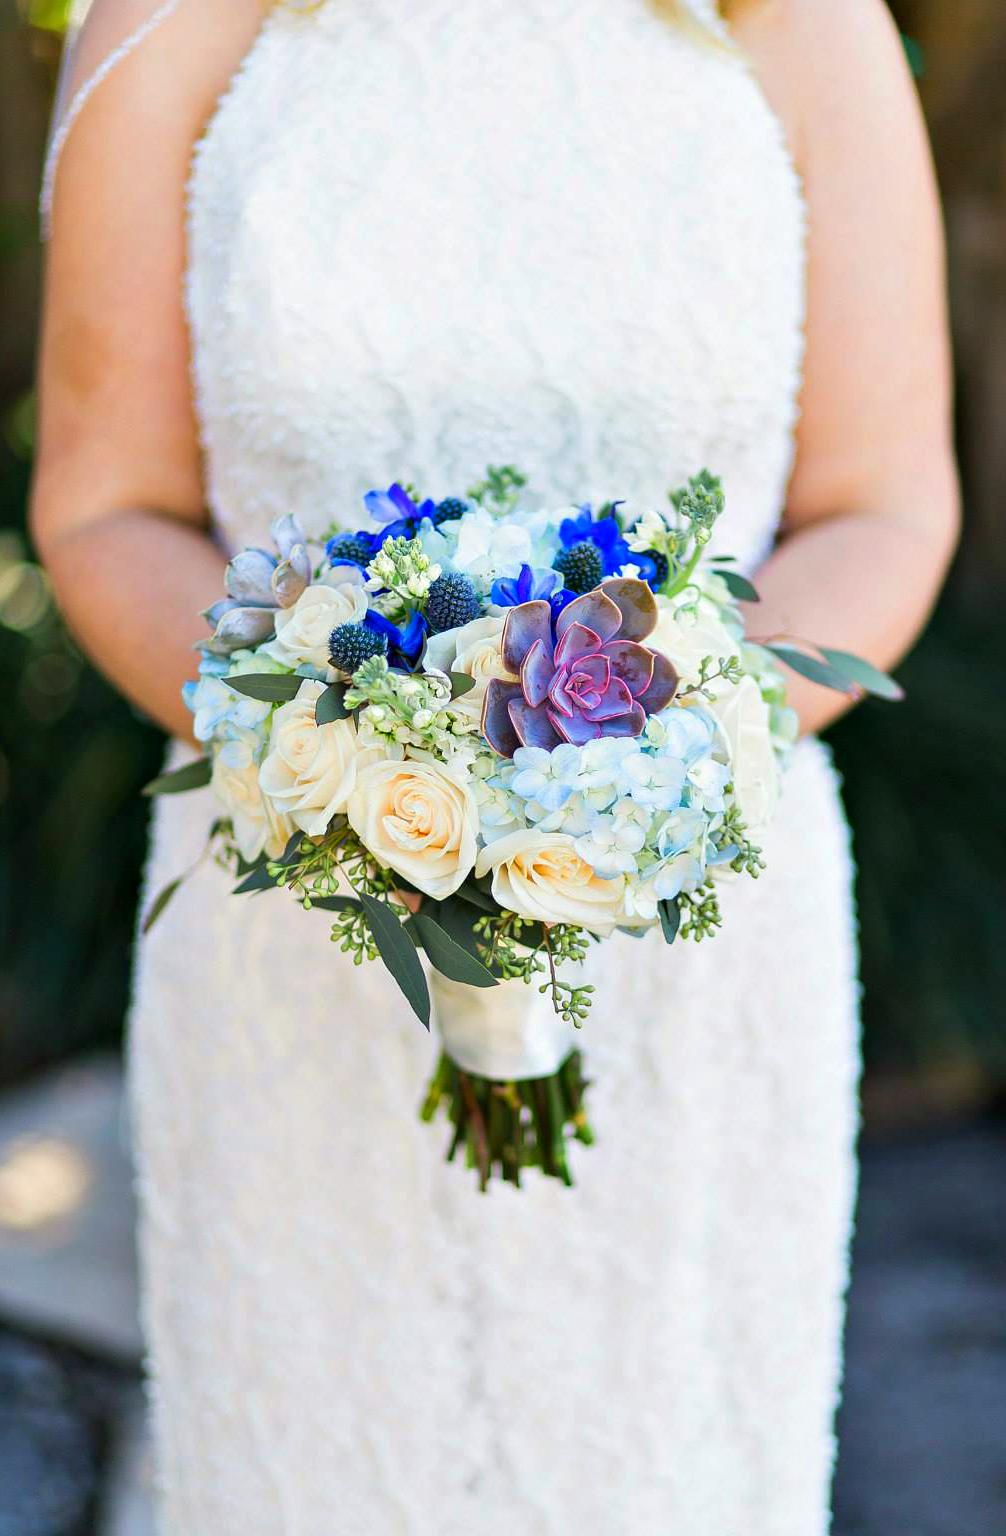 Palm Beach Wedding Flowers | Blue Bridal Bouquet | Gerilyn Gianna Floral Design